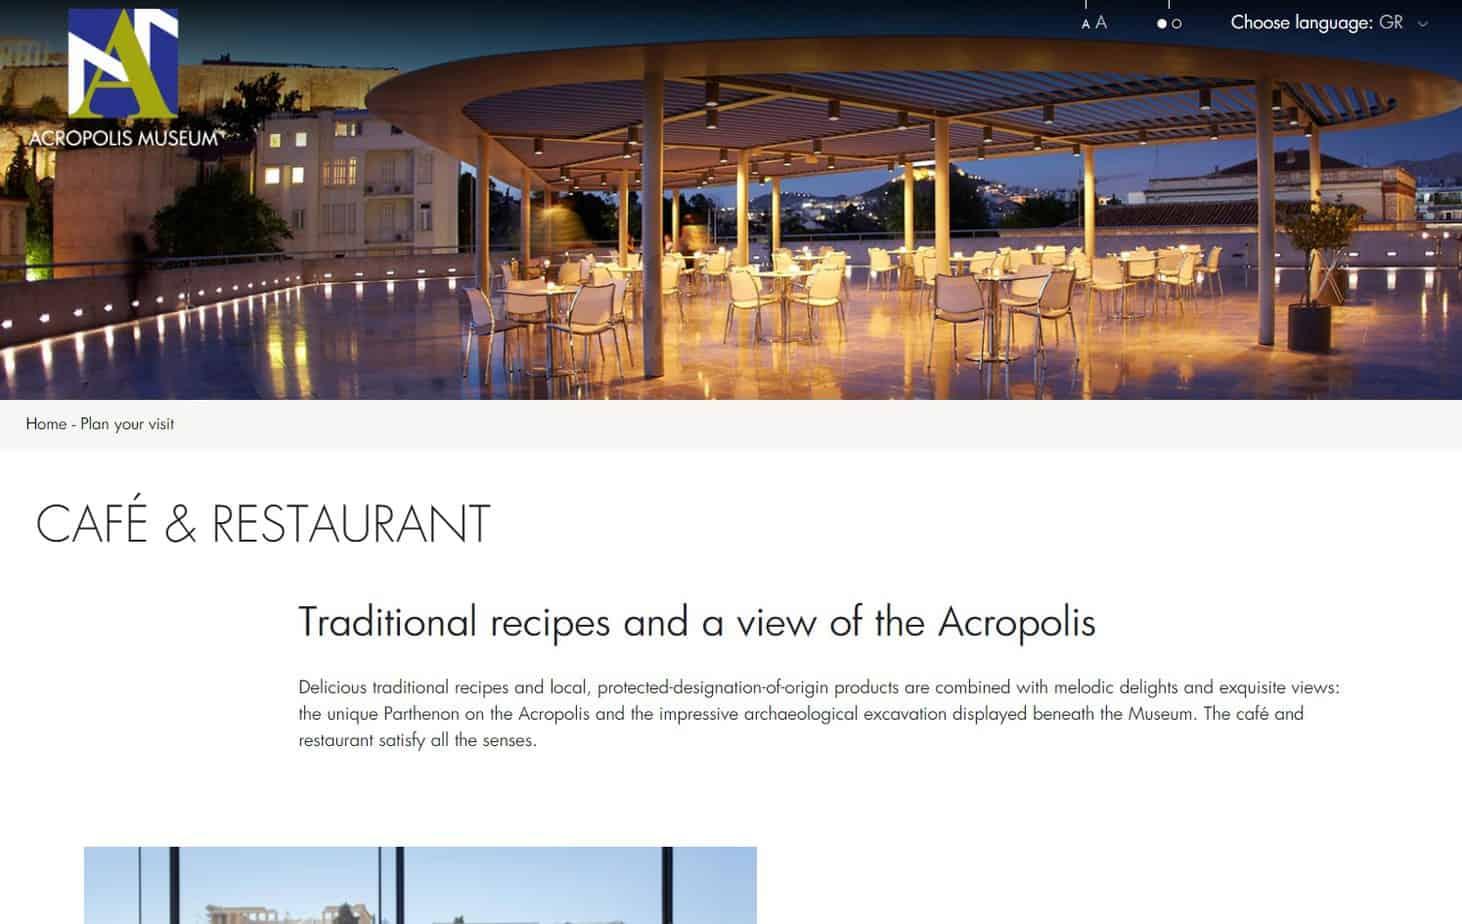 arcopolis view restaurants in athens